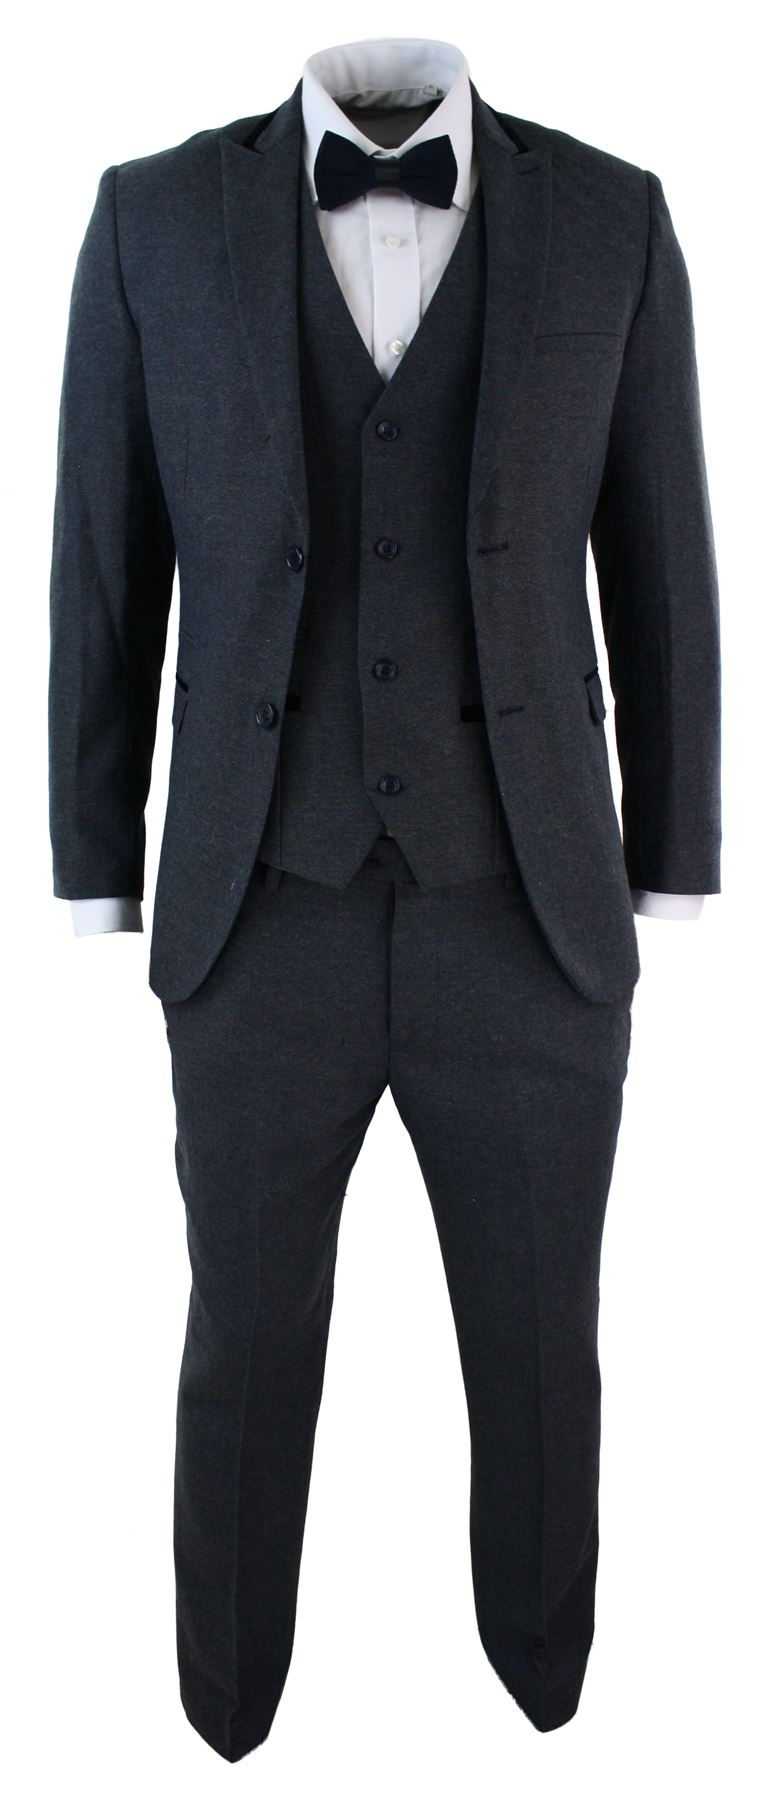 costume 3 pi ces hommes tweed herringbone bleu fonc. Black Bedroom Furniture Sets. Home Design Ideas